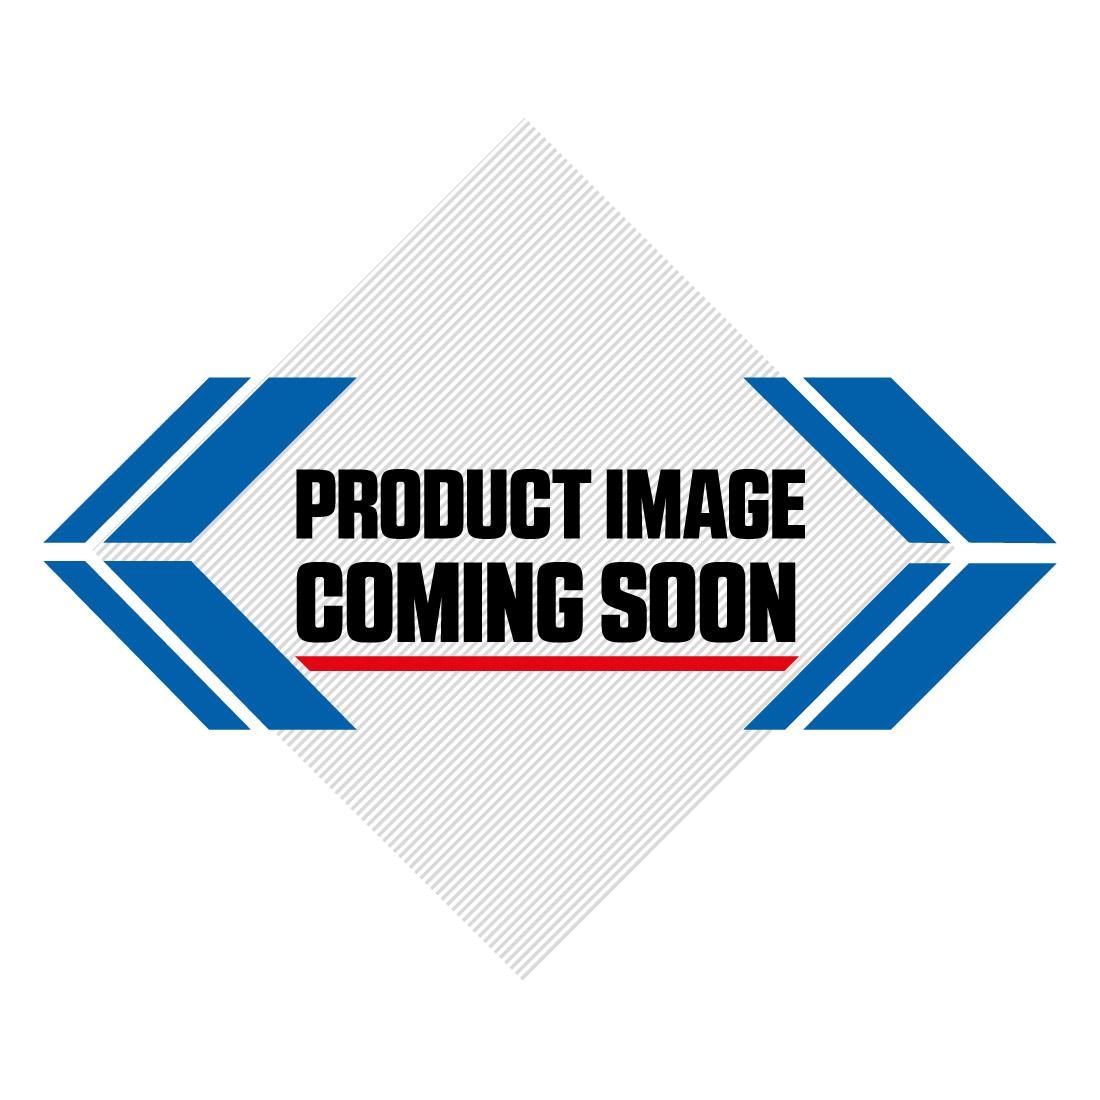 Honda Plastic Kit CRF 230 (15-20) OEM Factory Image-4>